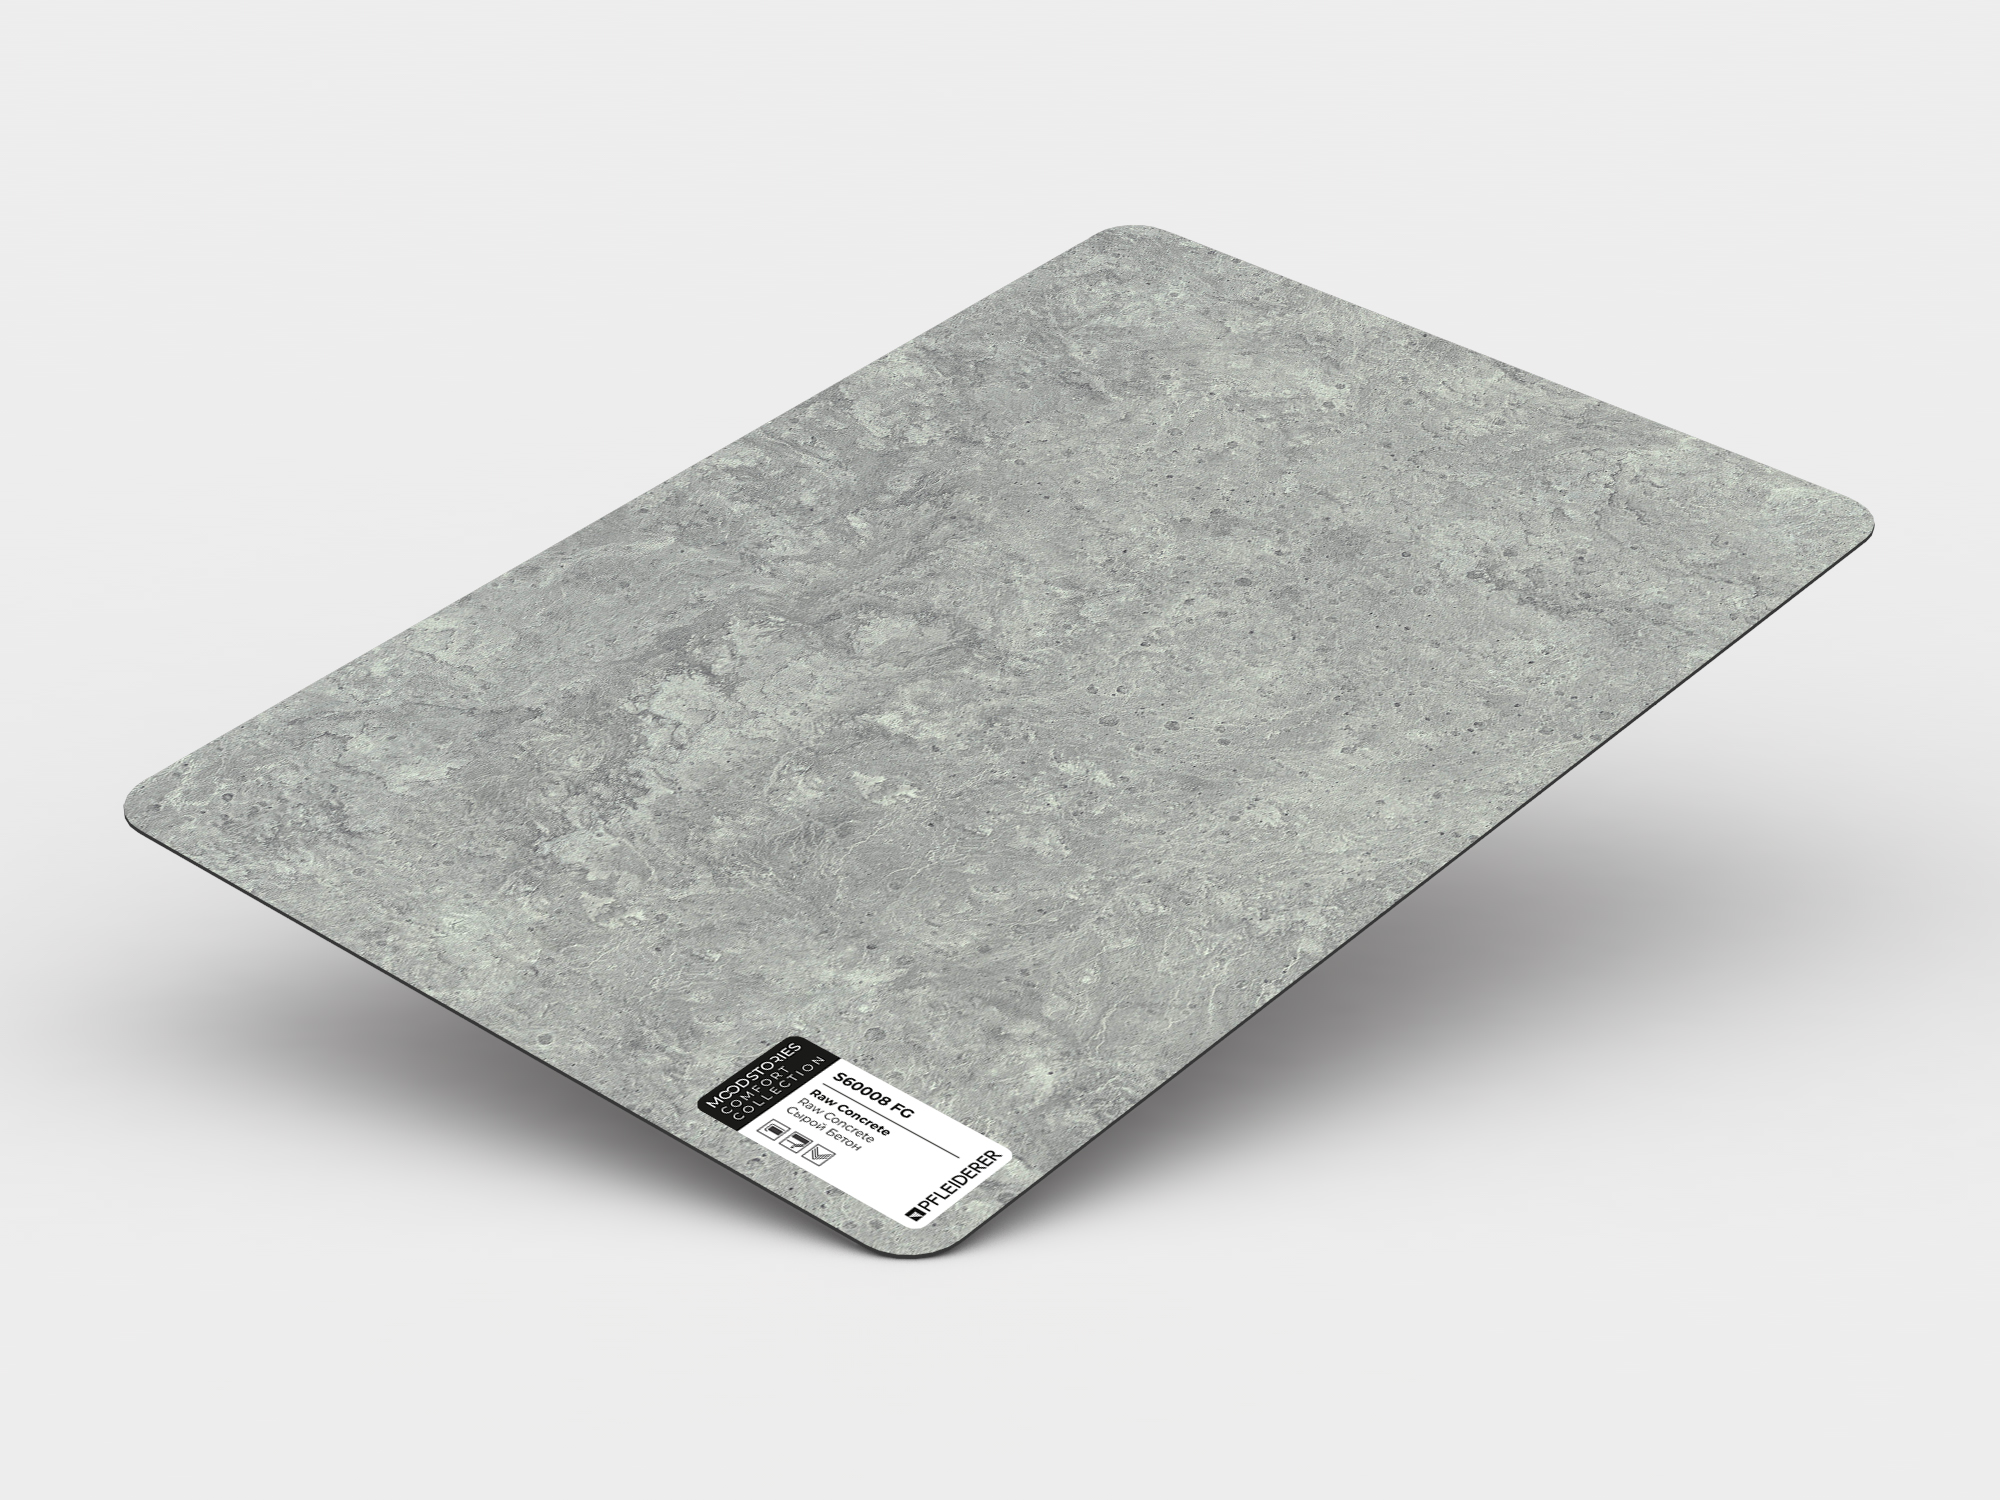 Raw Concrete S60008 FG